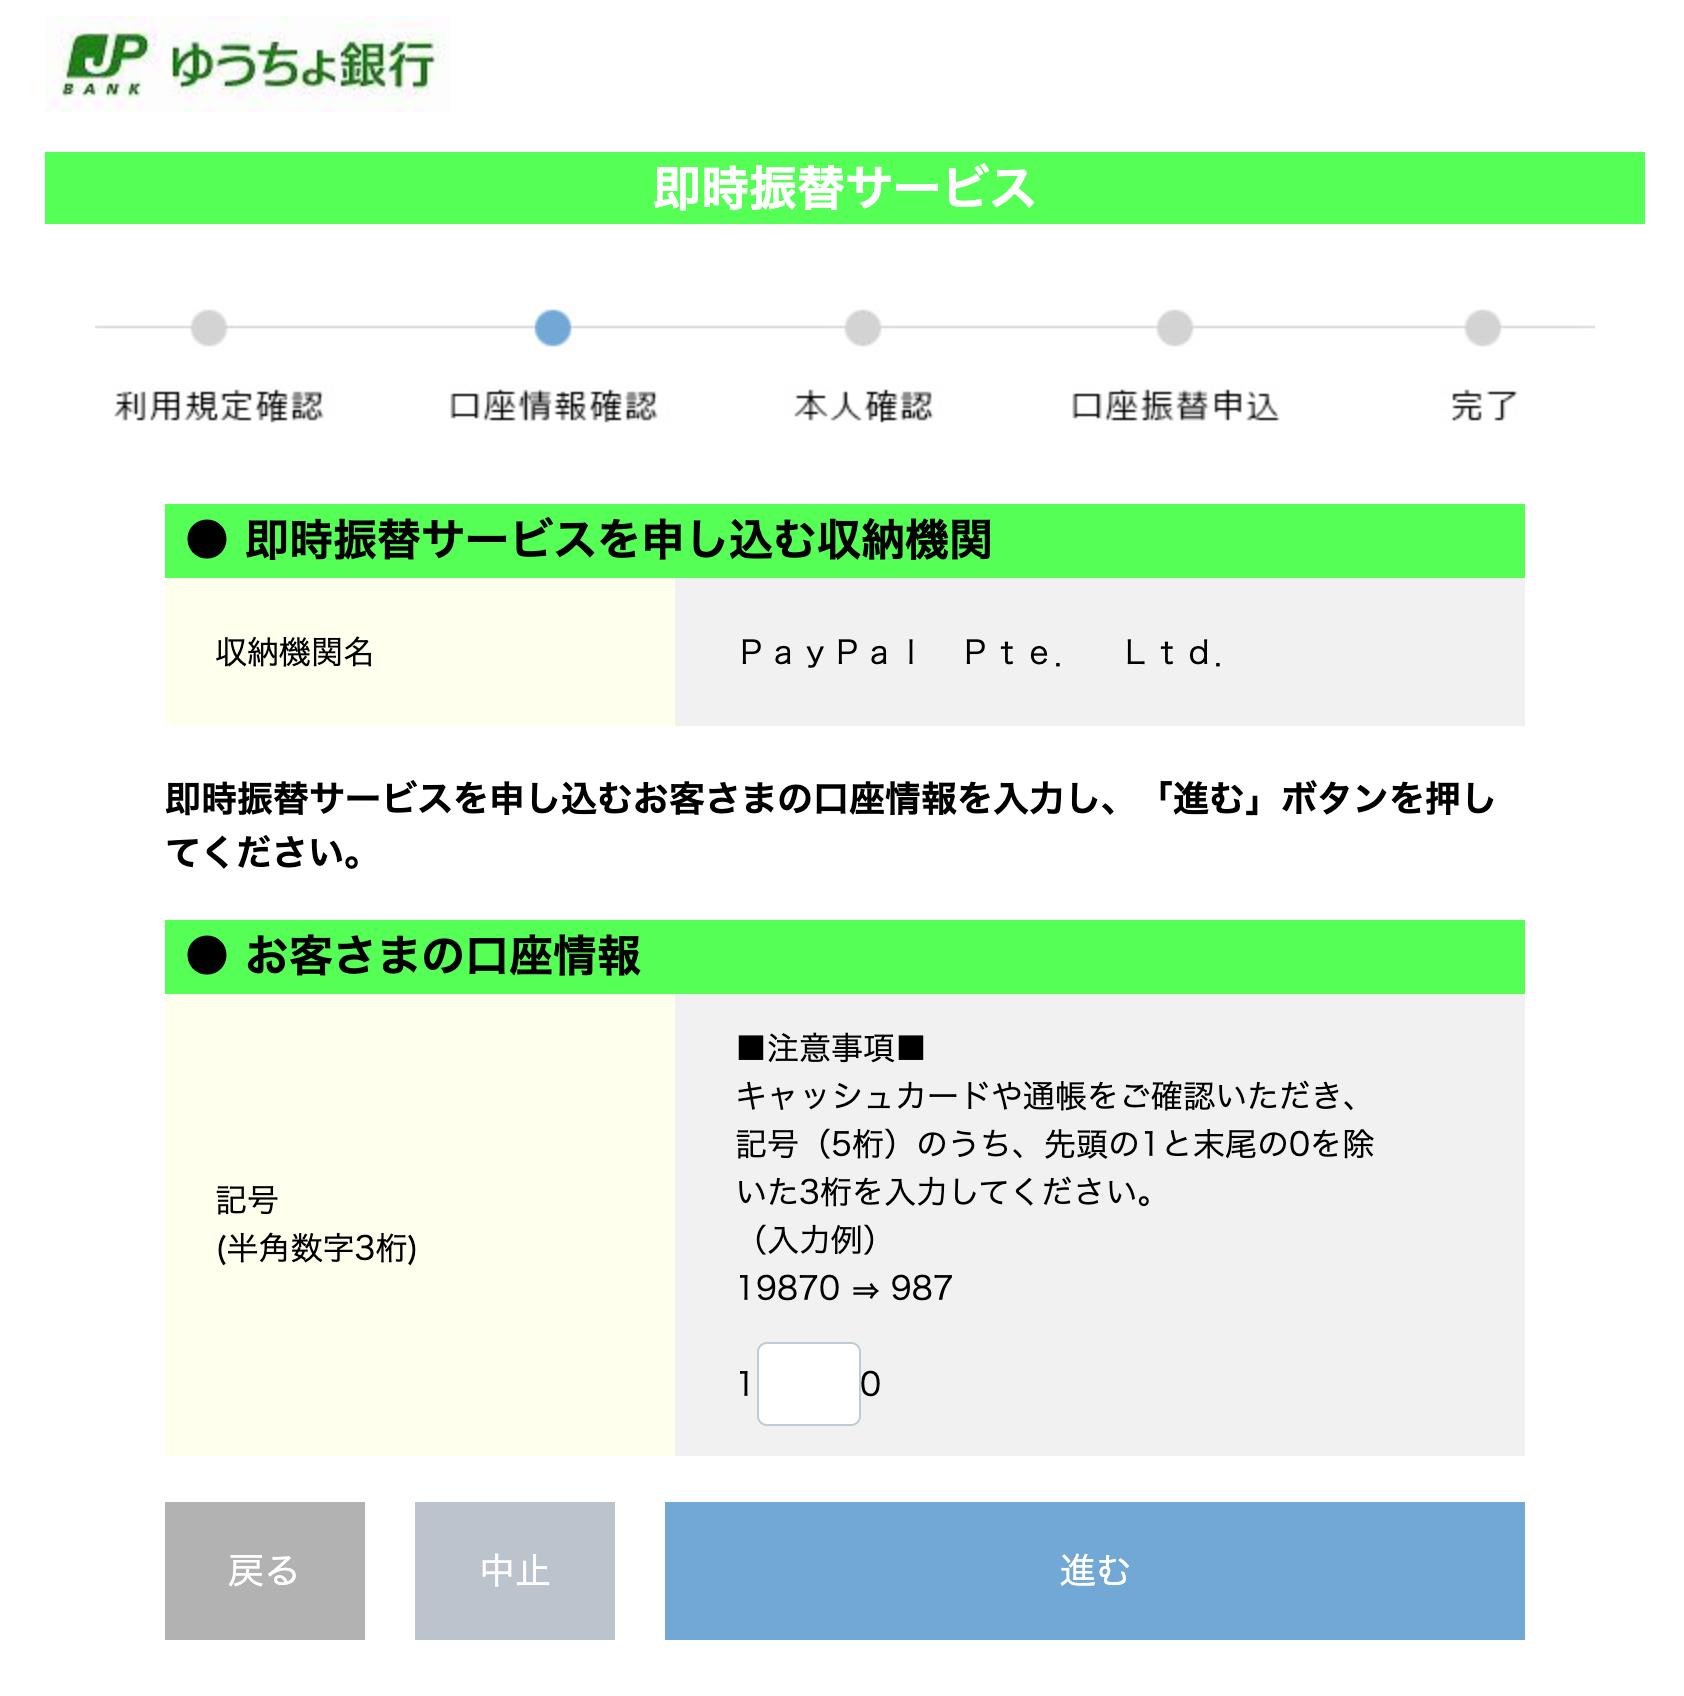 PayPal ゆうちょ銀行 口座記号を入力